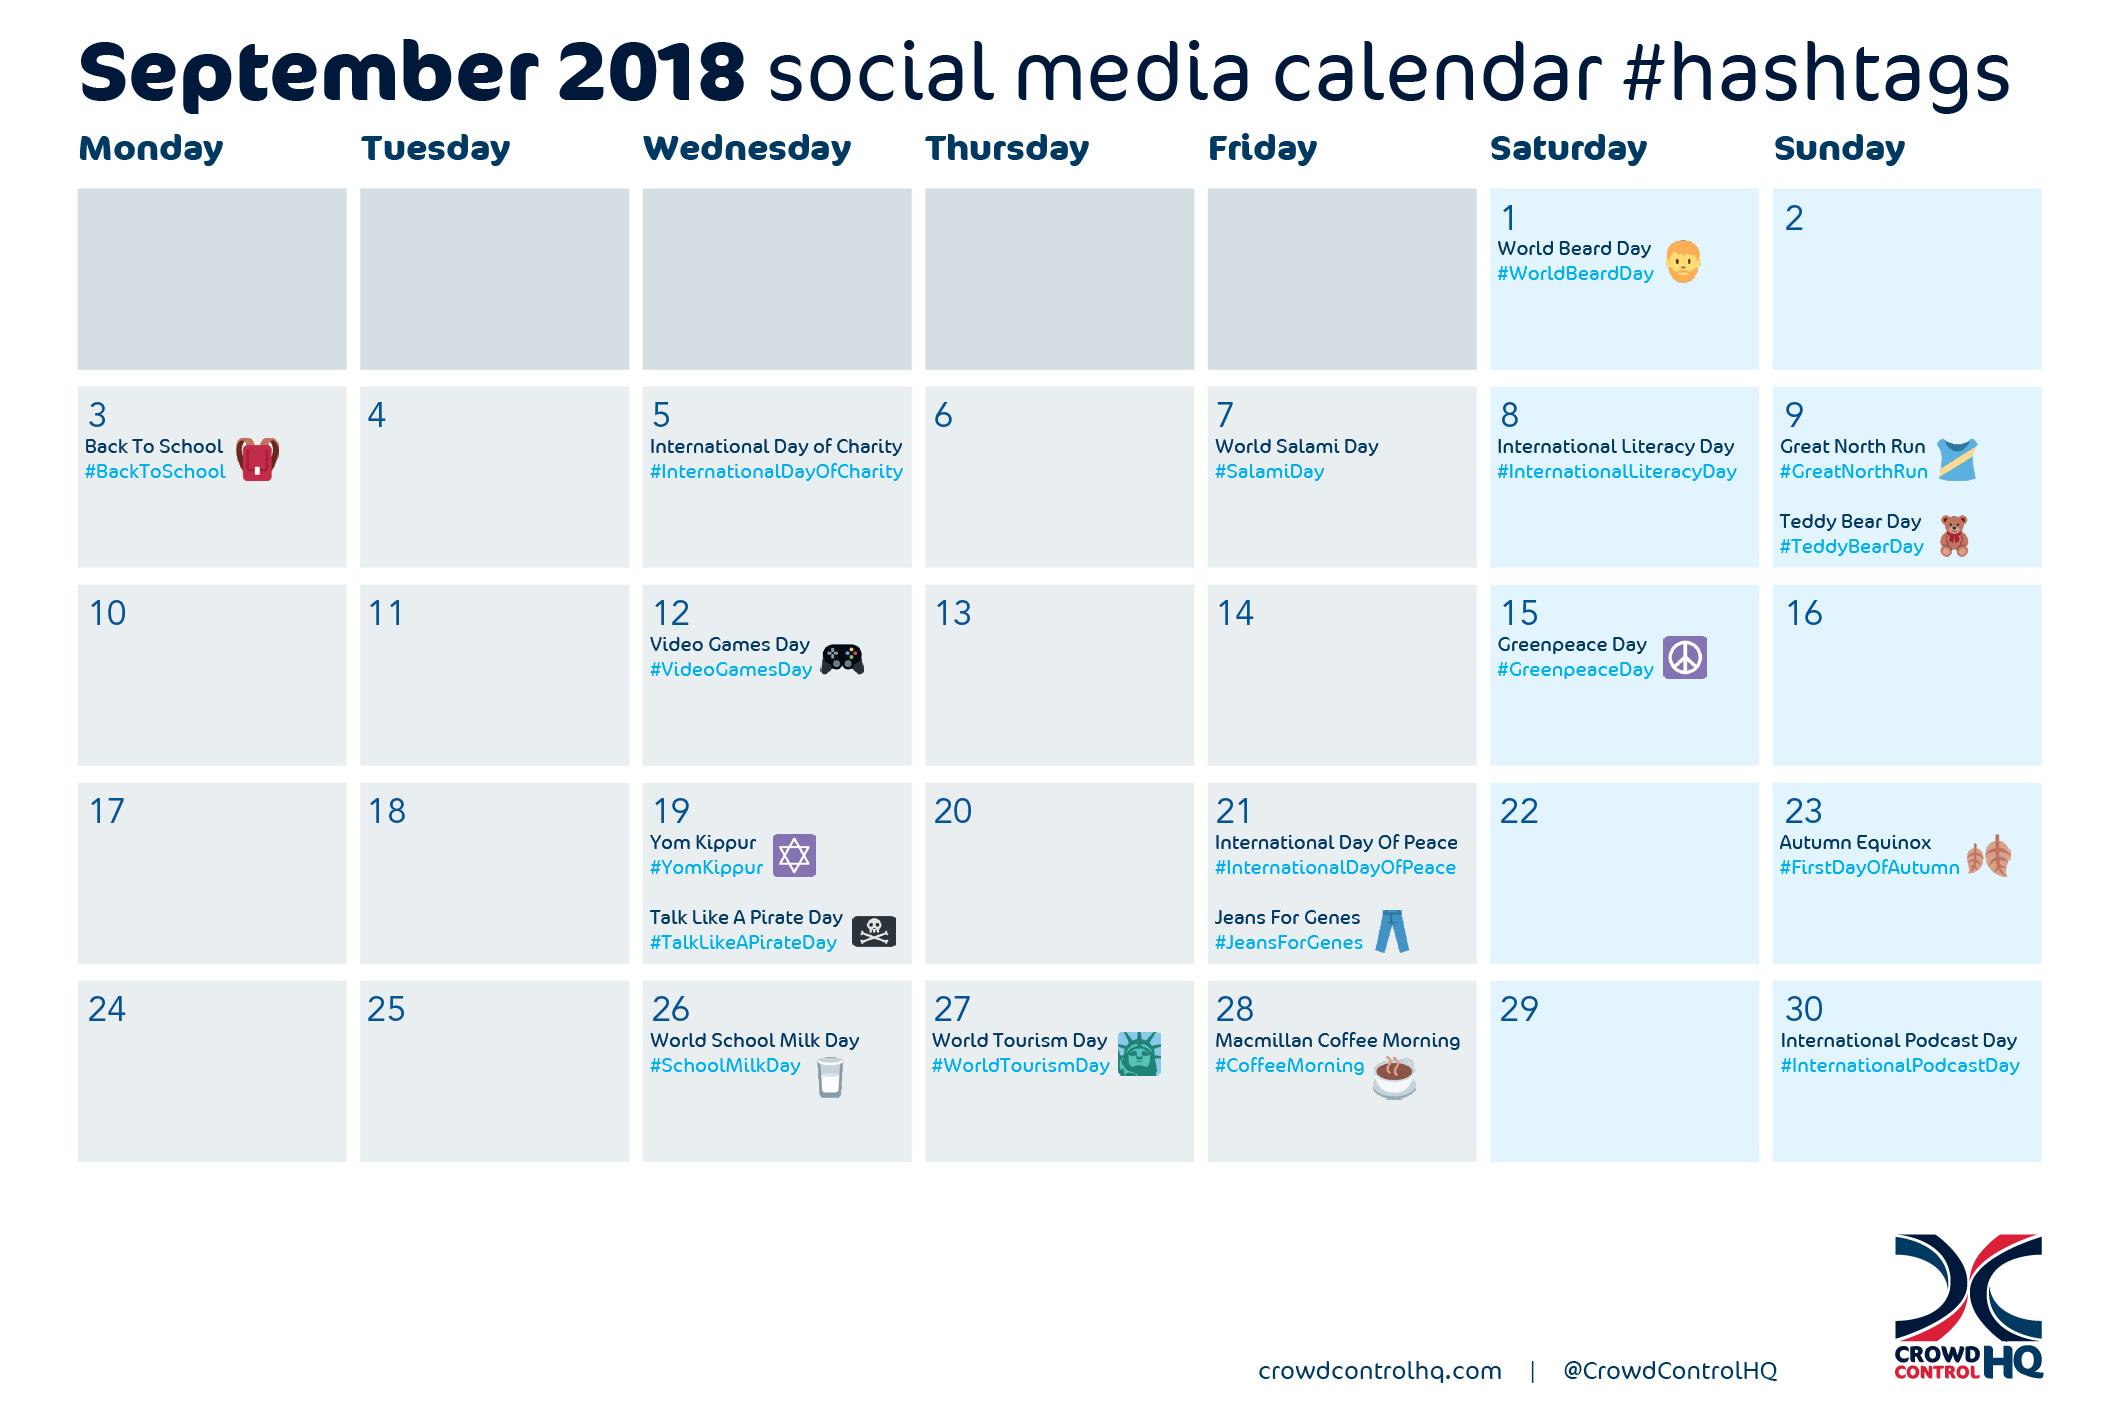 September 2018 social media calendar content & #hashtag ideas